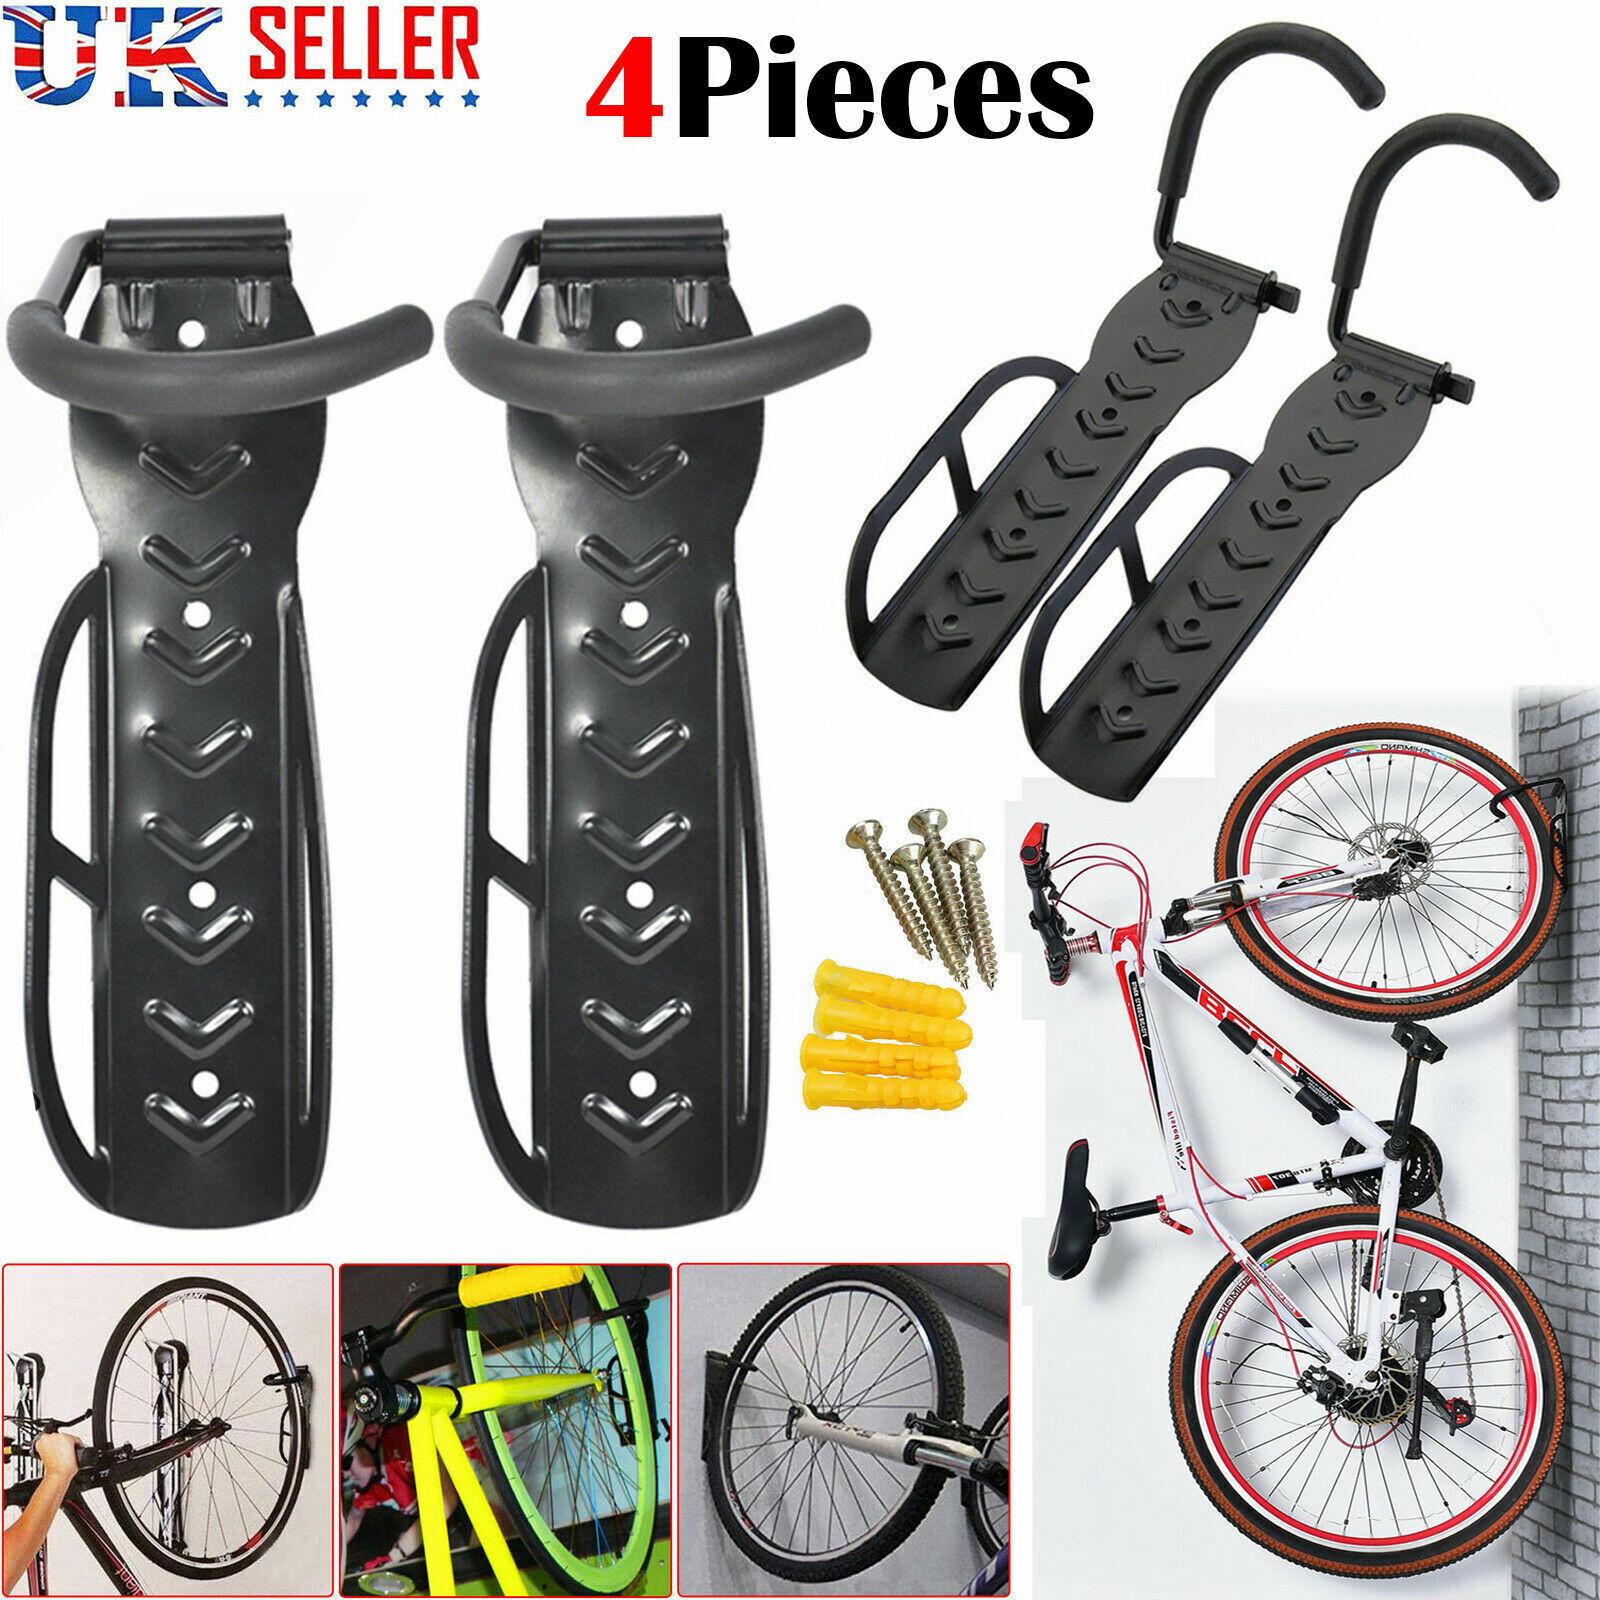 2x Bike Bicycle Wall Mounted Mount Hanger Holder Rack Stand Garage Hooks Storage